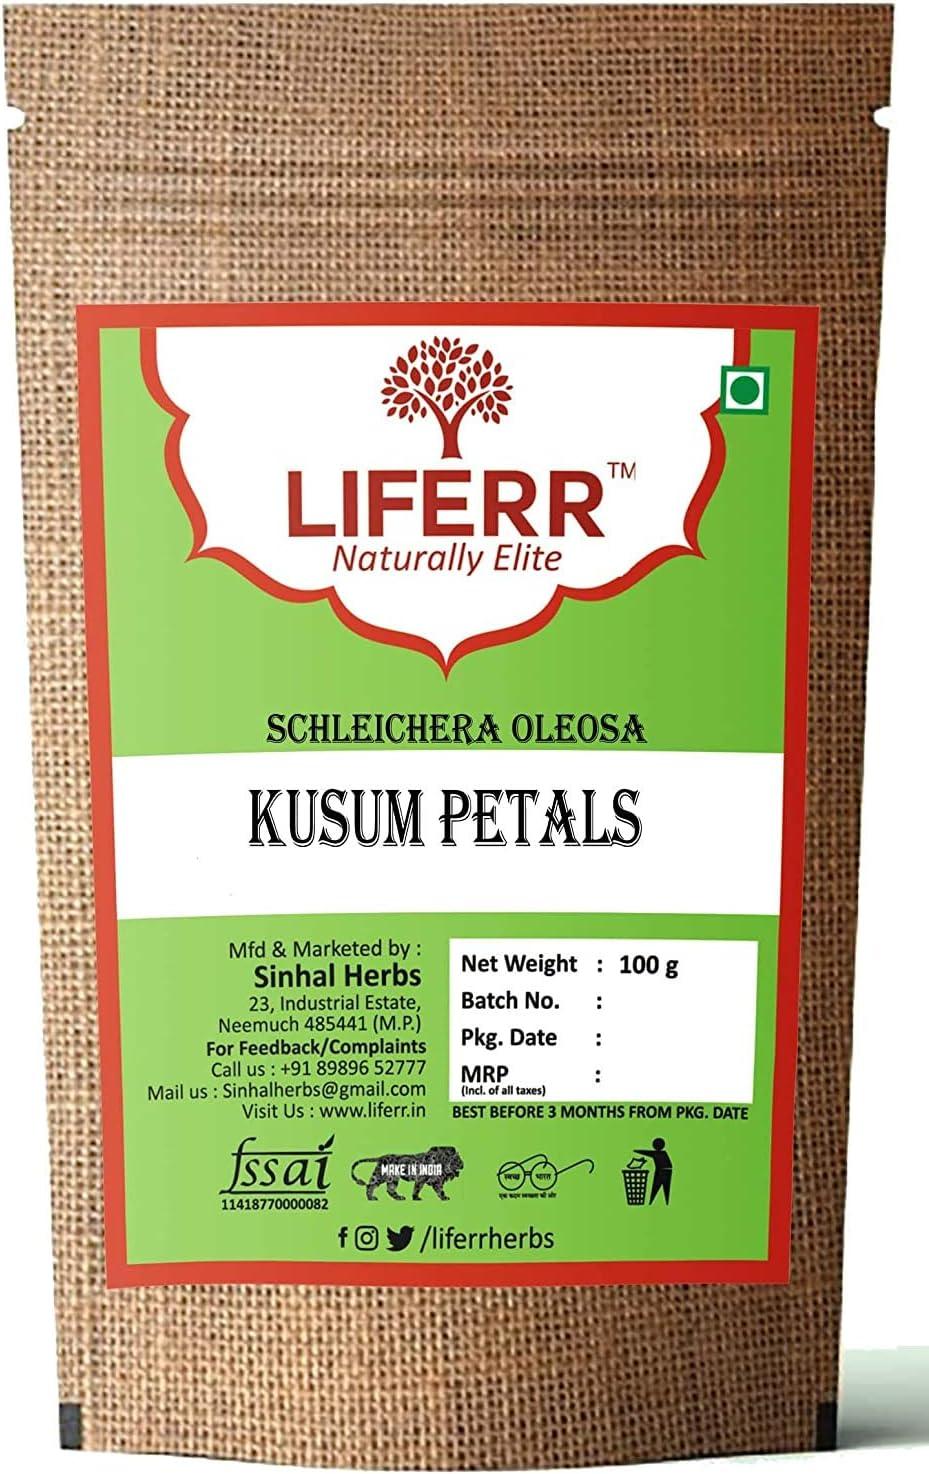 High quality GKH LIFERR Kusum Petals Factory outlet American Sc Kesar Safflower